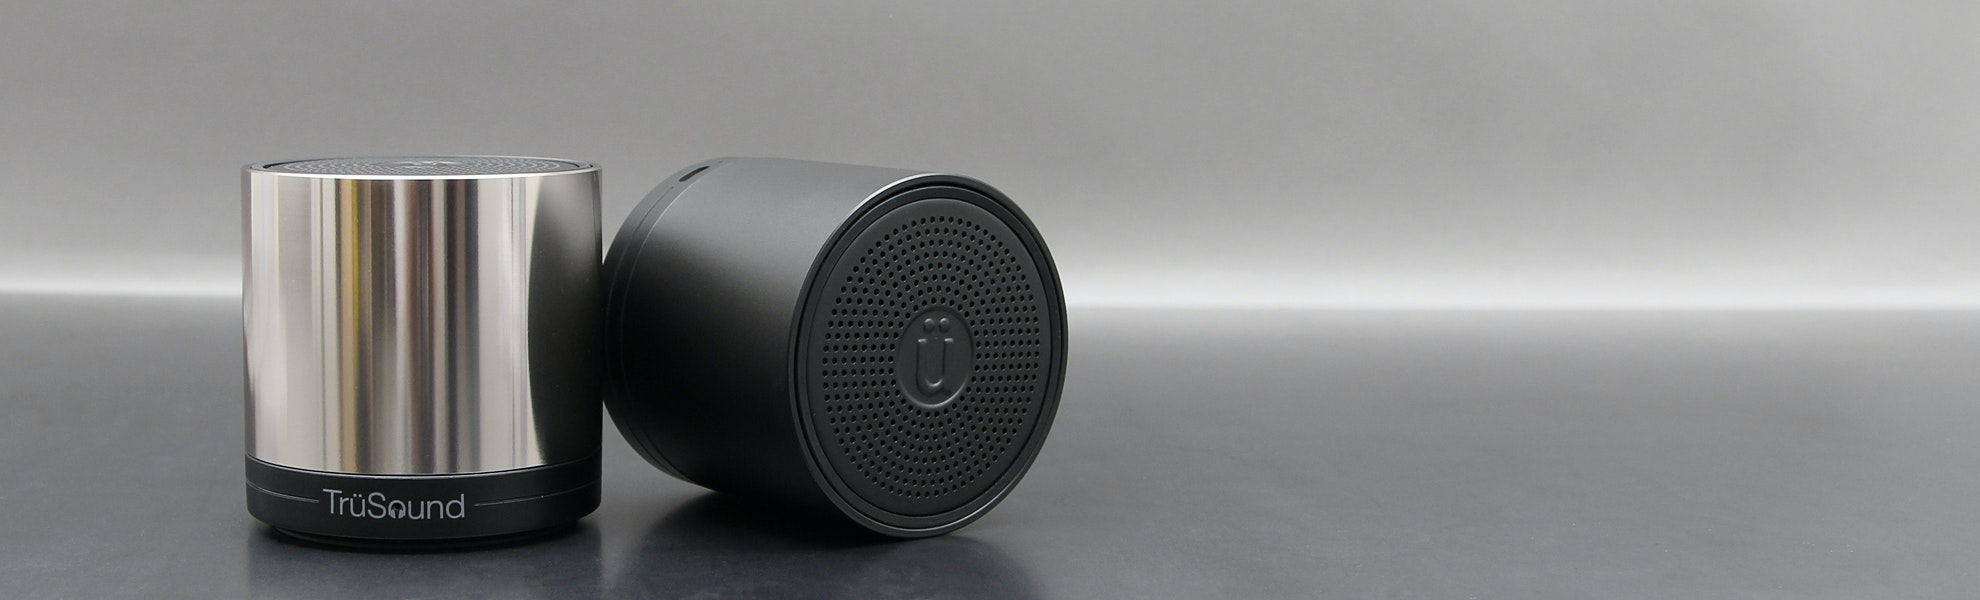 TruSound T2 Bluetooth Speakers